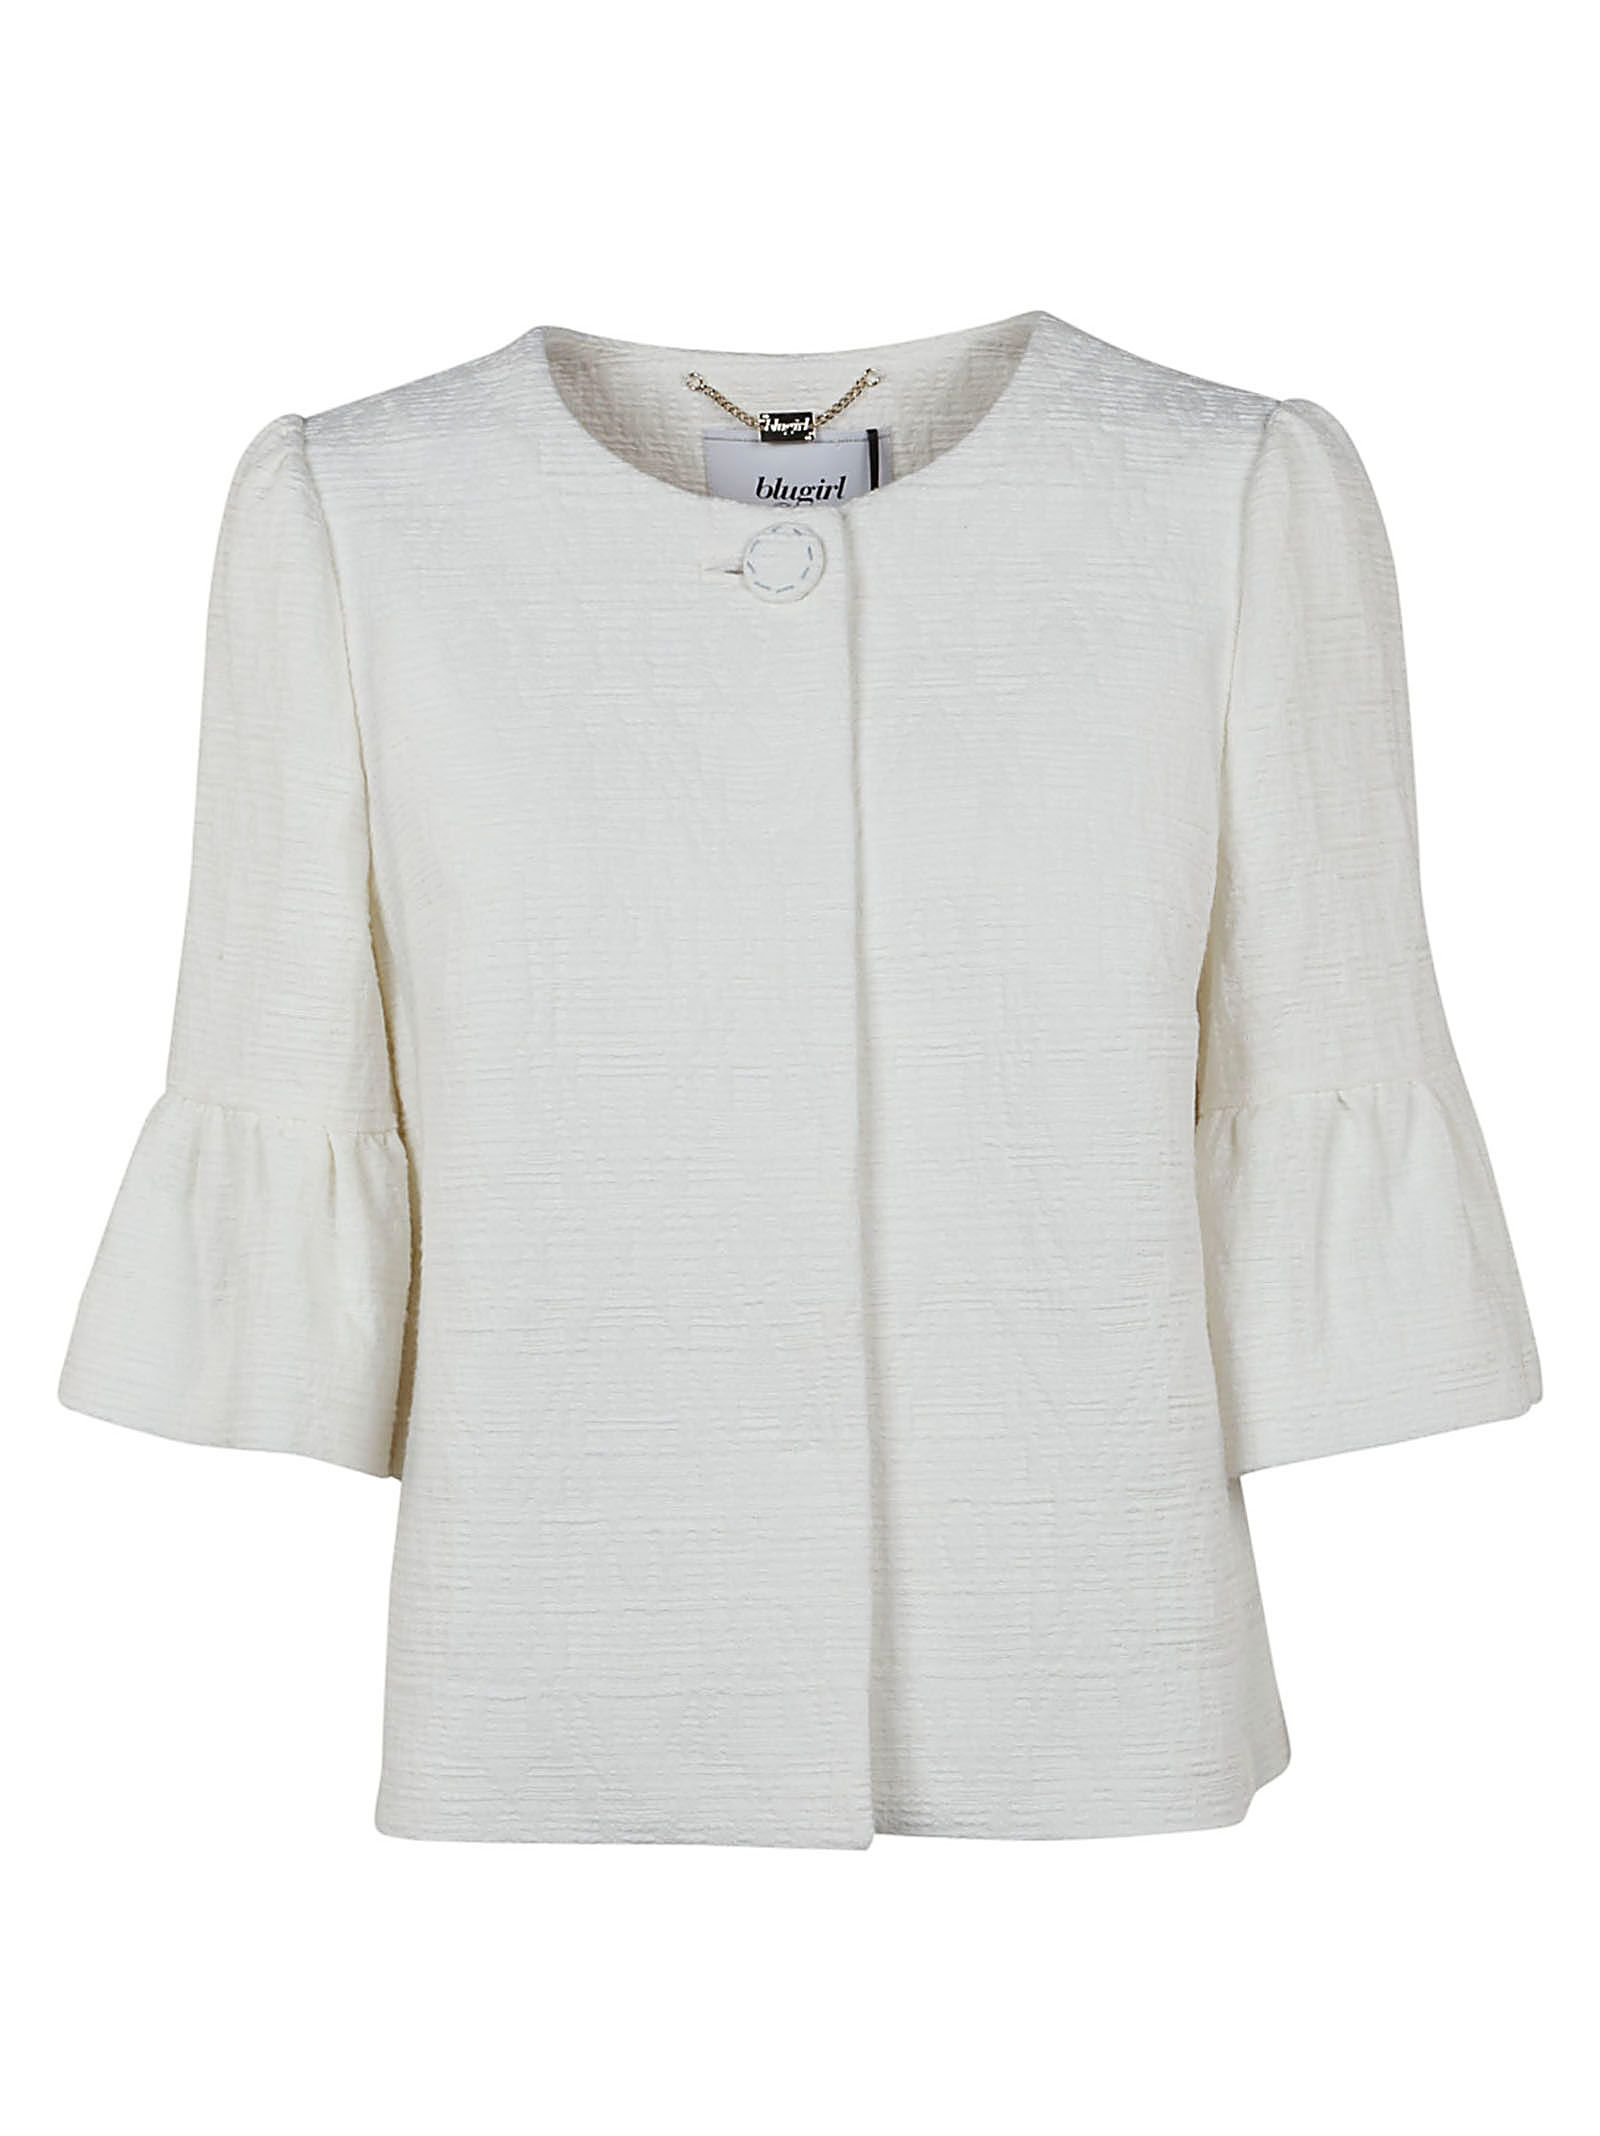 Jacquard jacket Blugirl Cheap Sale Choice 2018 Sale Online Buy Cheap Newest OfIhoAuL6